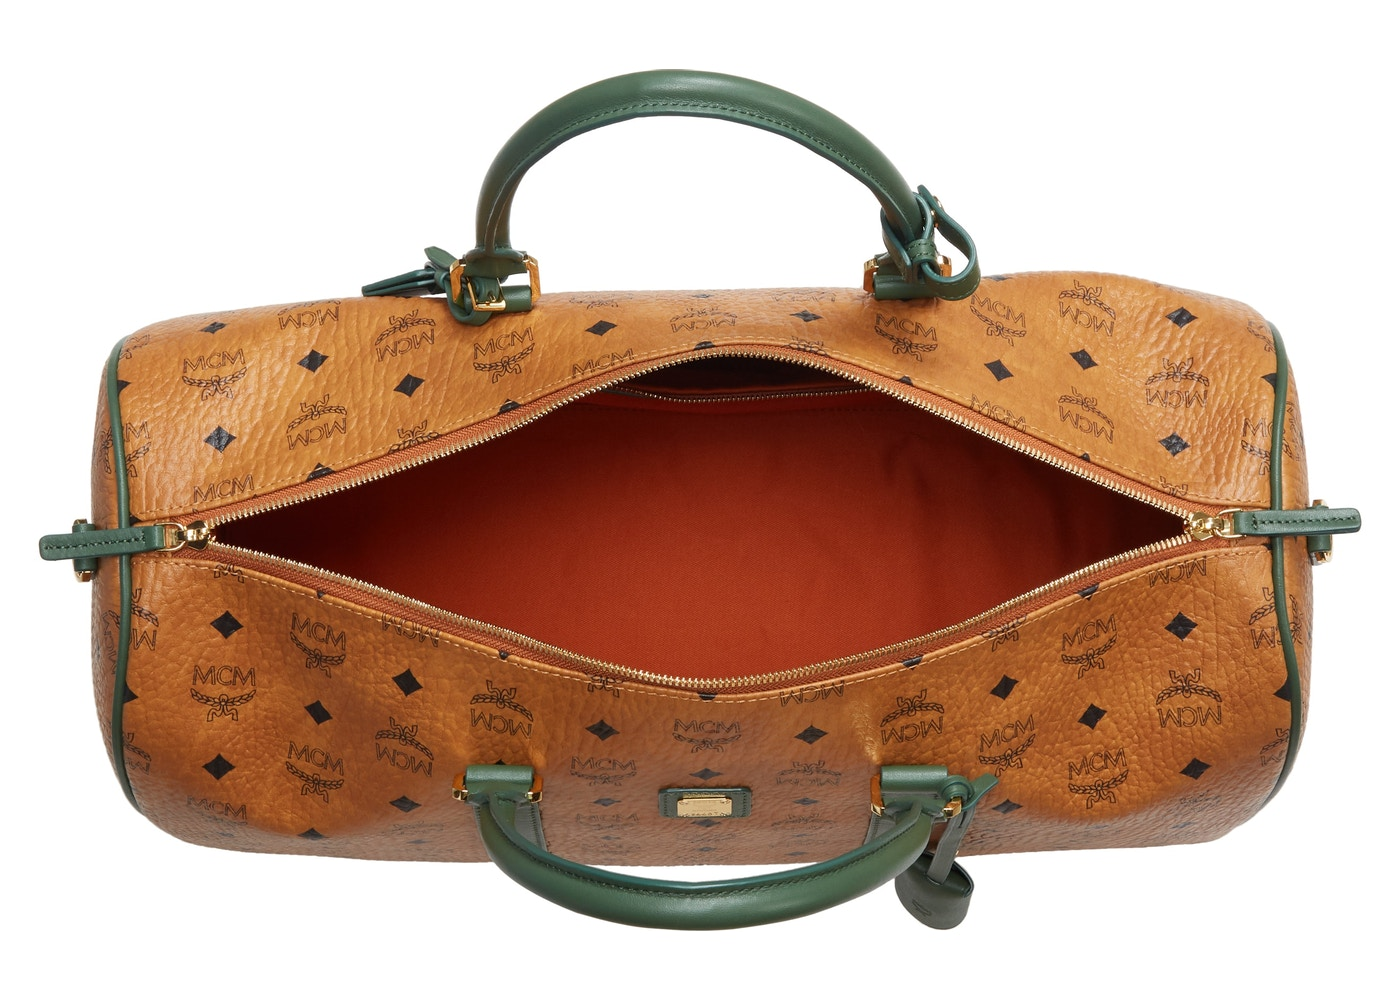 c43afe23b08 MCM Vintage Weekend Bag Visetos Nordstrom Exclusive Medium Cognac/Safari  Green